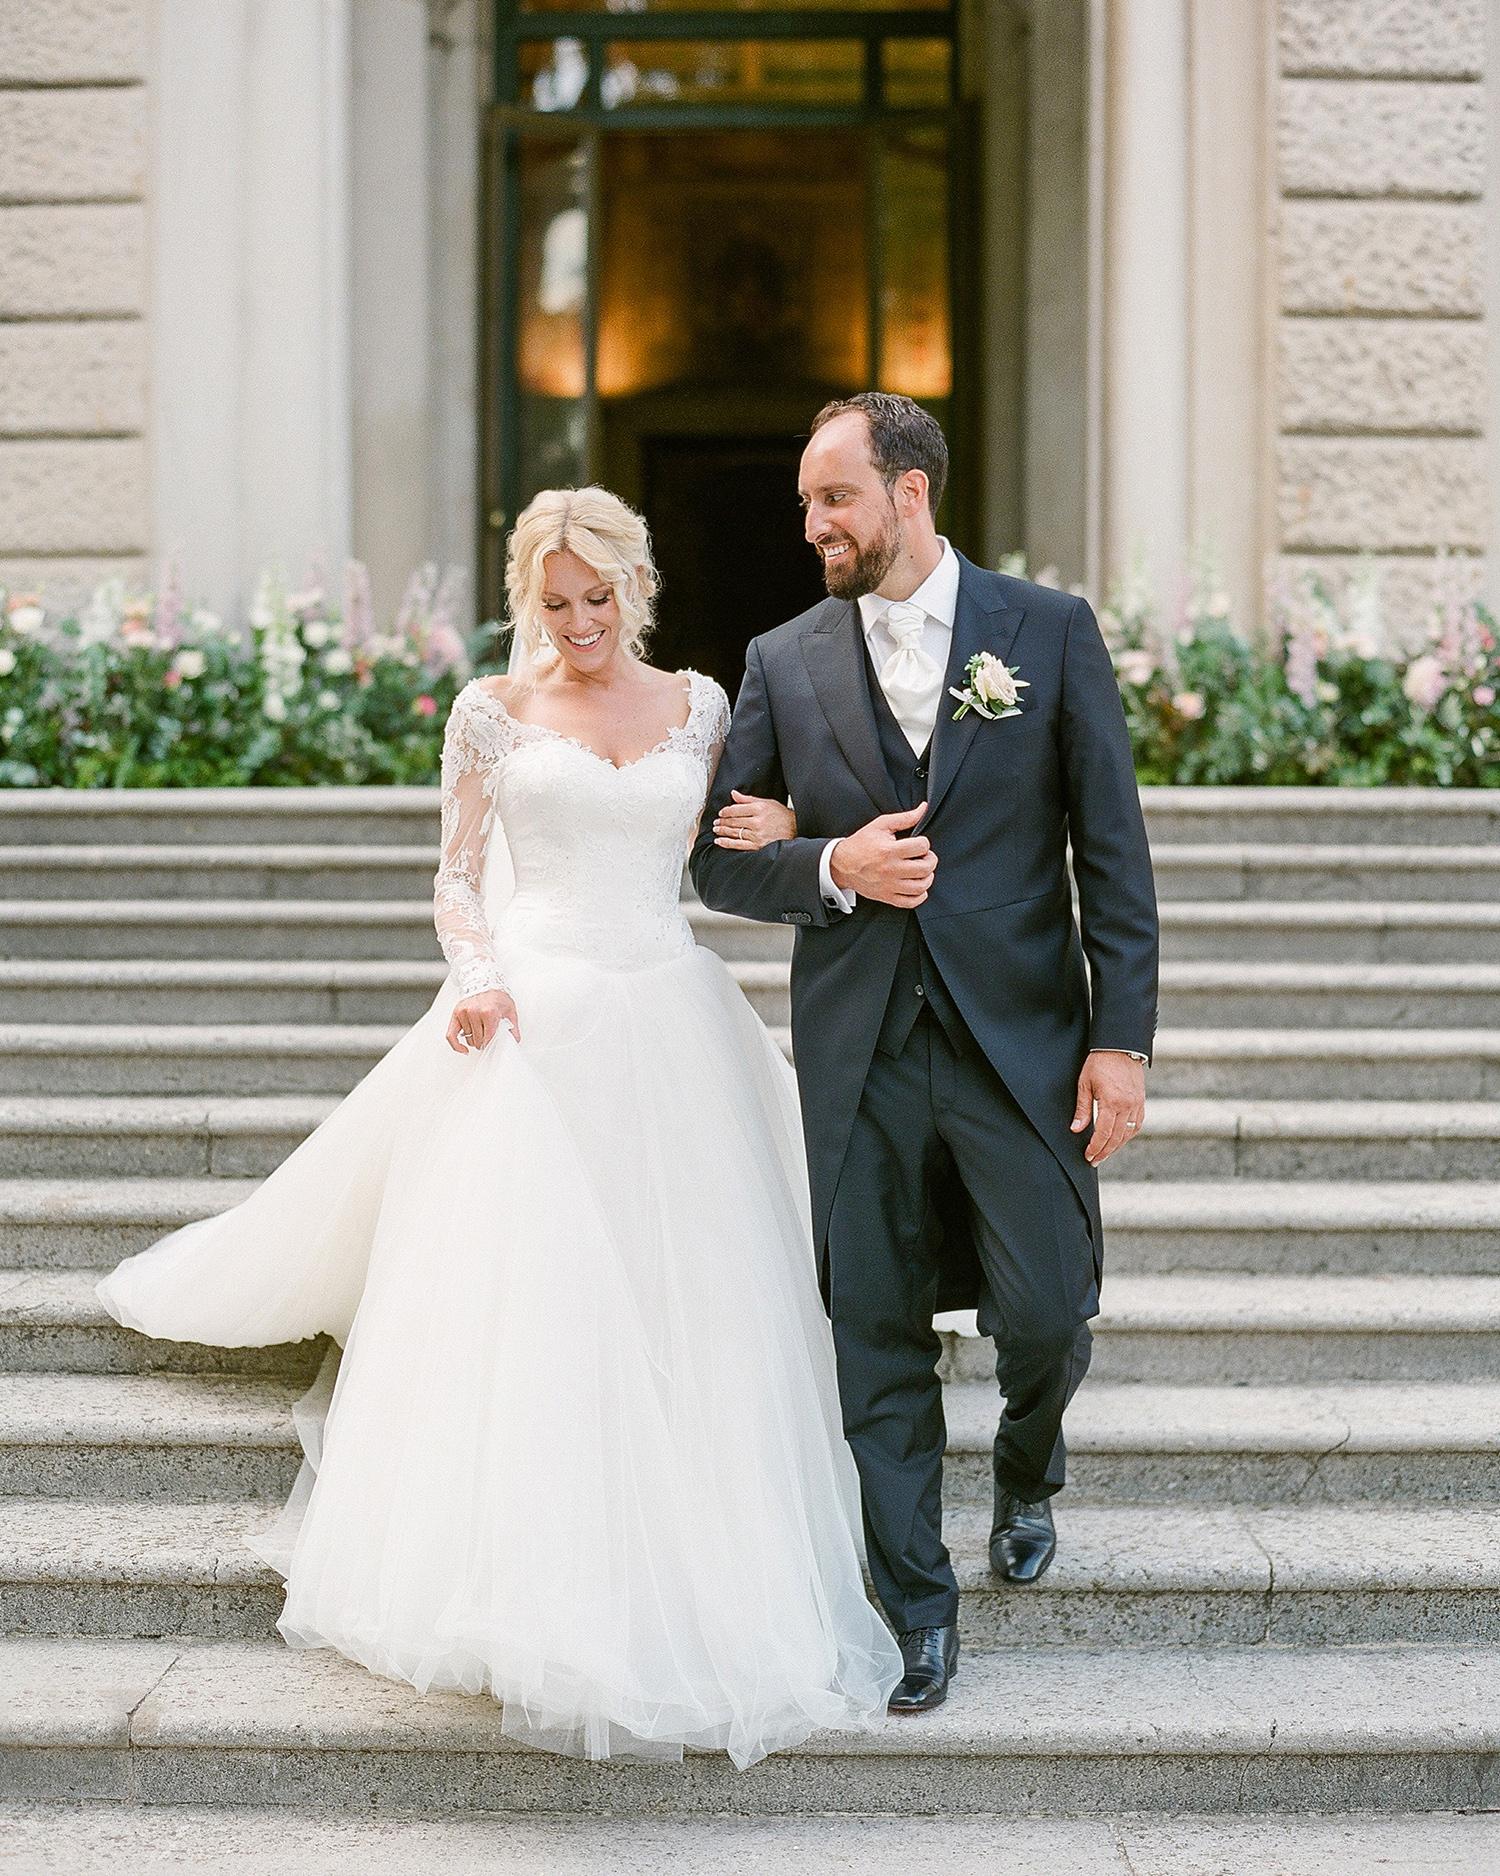 julia mauro wedding couple on steps